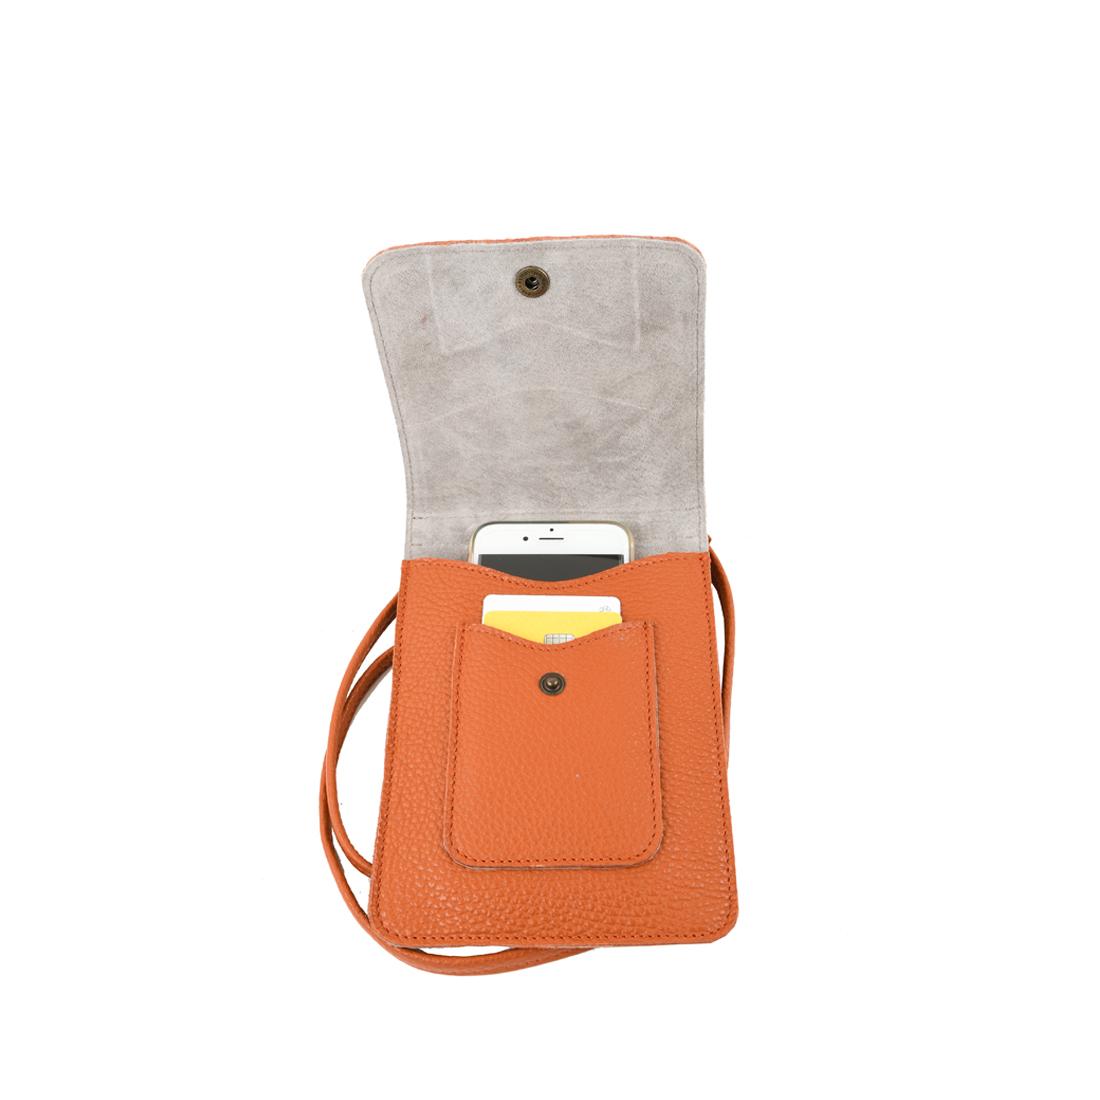 Zoe burnt orange phone pouche